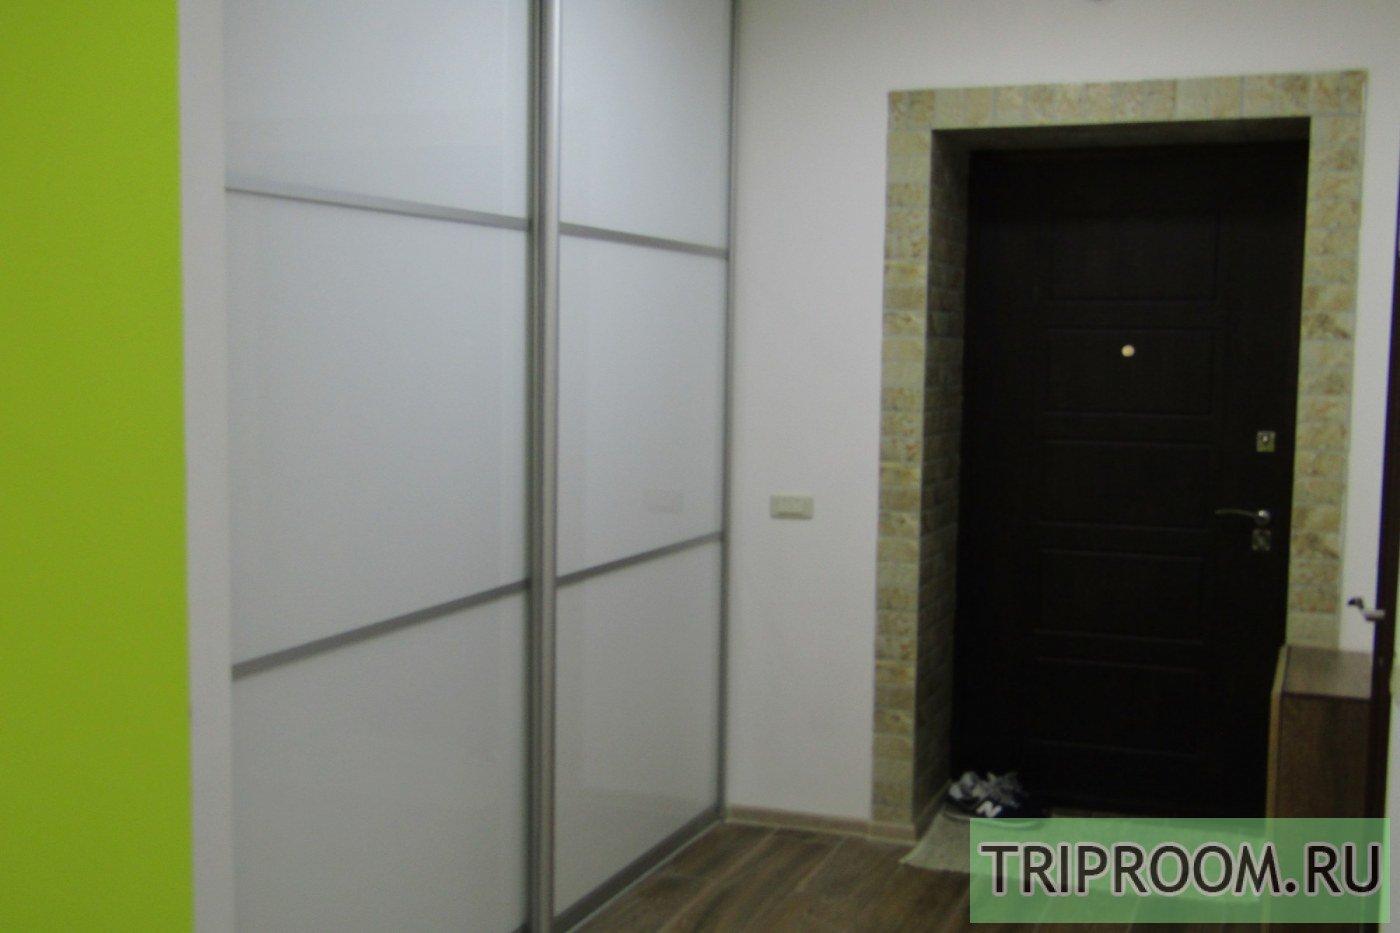 1-комнатная квартира посуточно (вариант № 37389), ул. Лозицкой улица, фото № 8